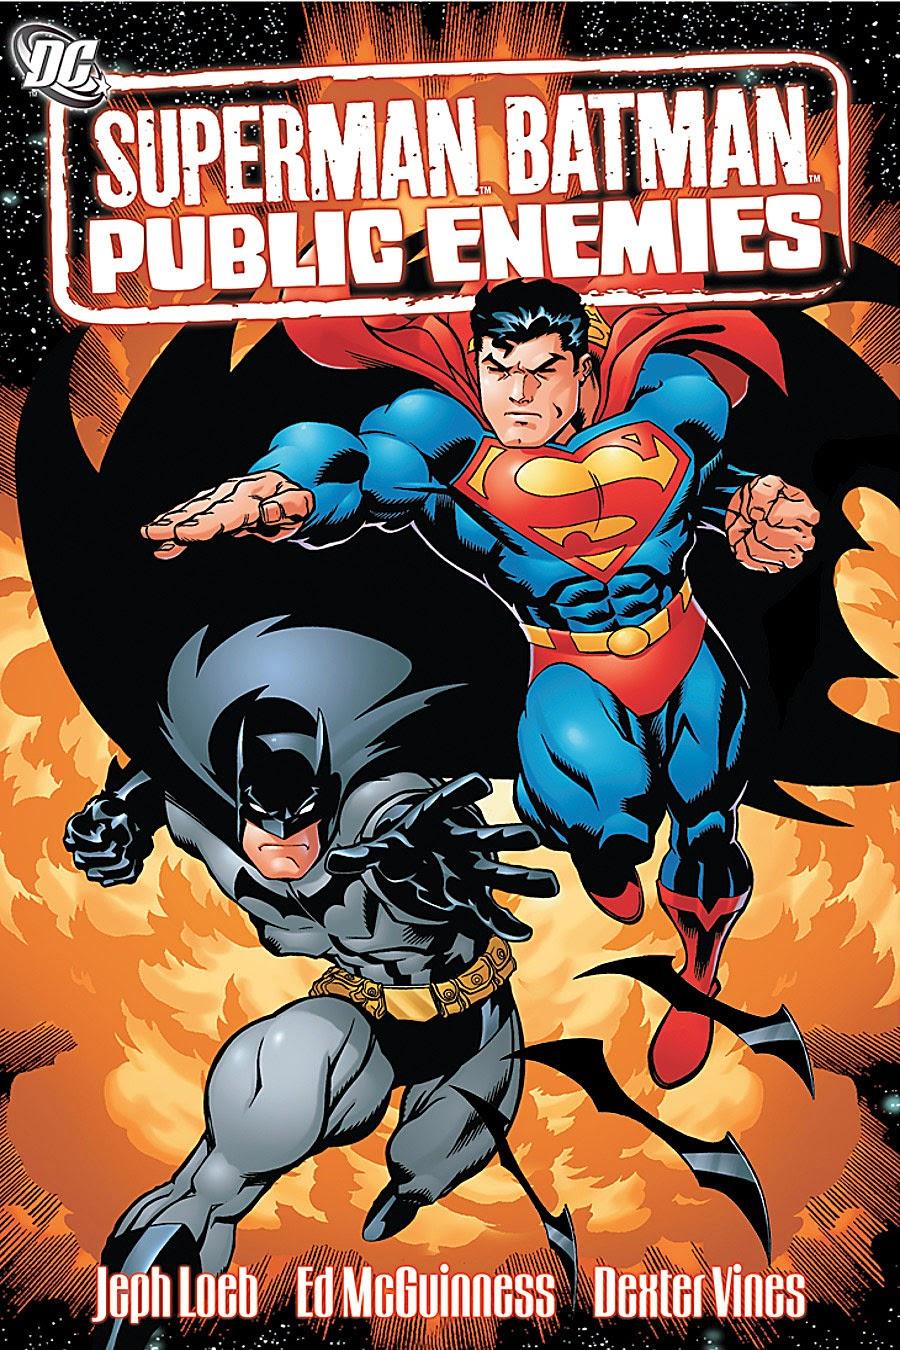 http://3.bp.blogspot.com/-lVBETJEAfec/VAoSIHAVsBI/AAAAAAAACIA/4BbMRuWi0CQ/s1600/peliculas-Superman-Batman-1-Enemigos-Publicos-online.jpg